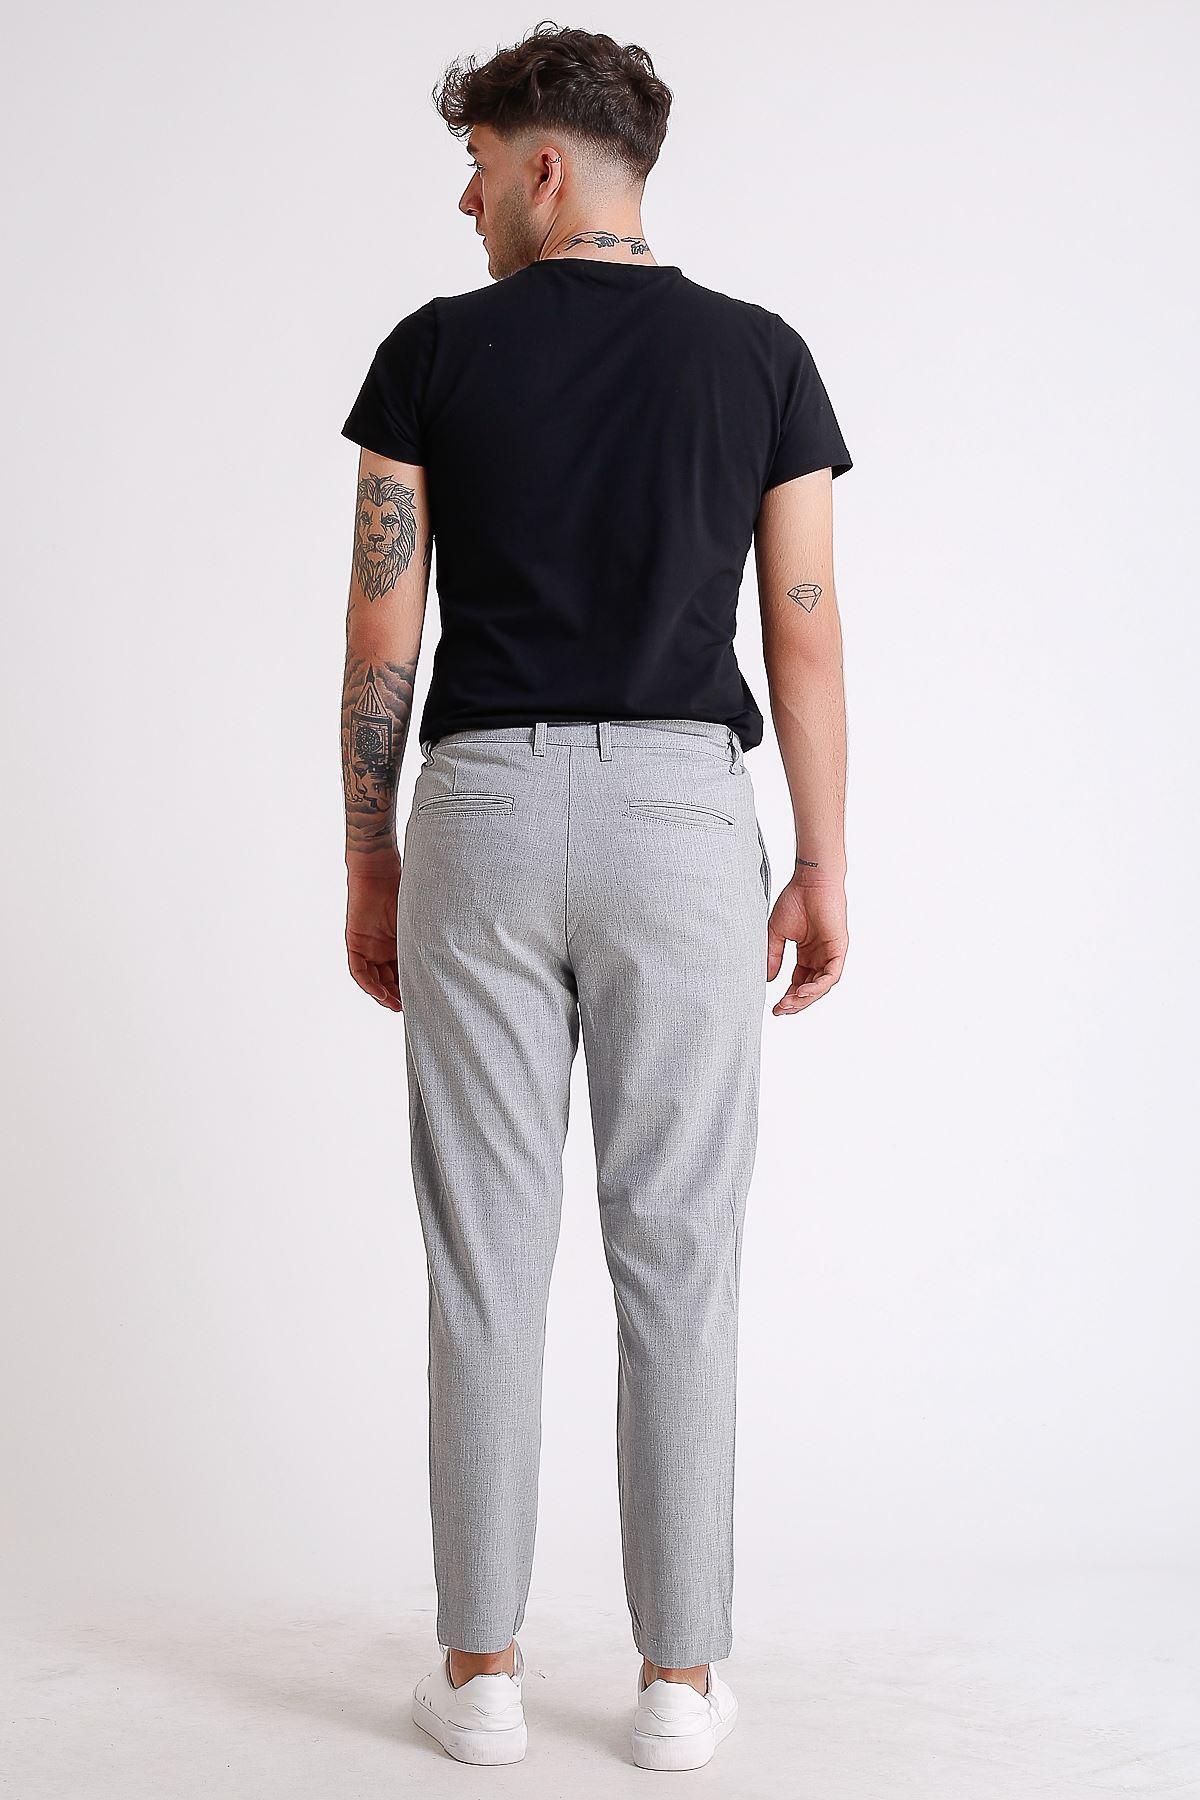 Erkek Beli Lastikli İpli açık Gri Jogger Pantolon